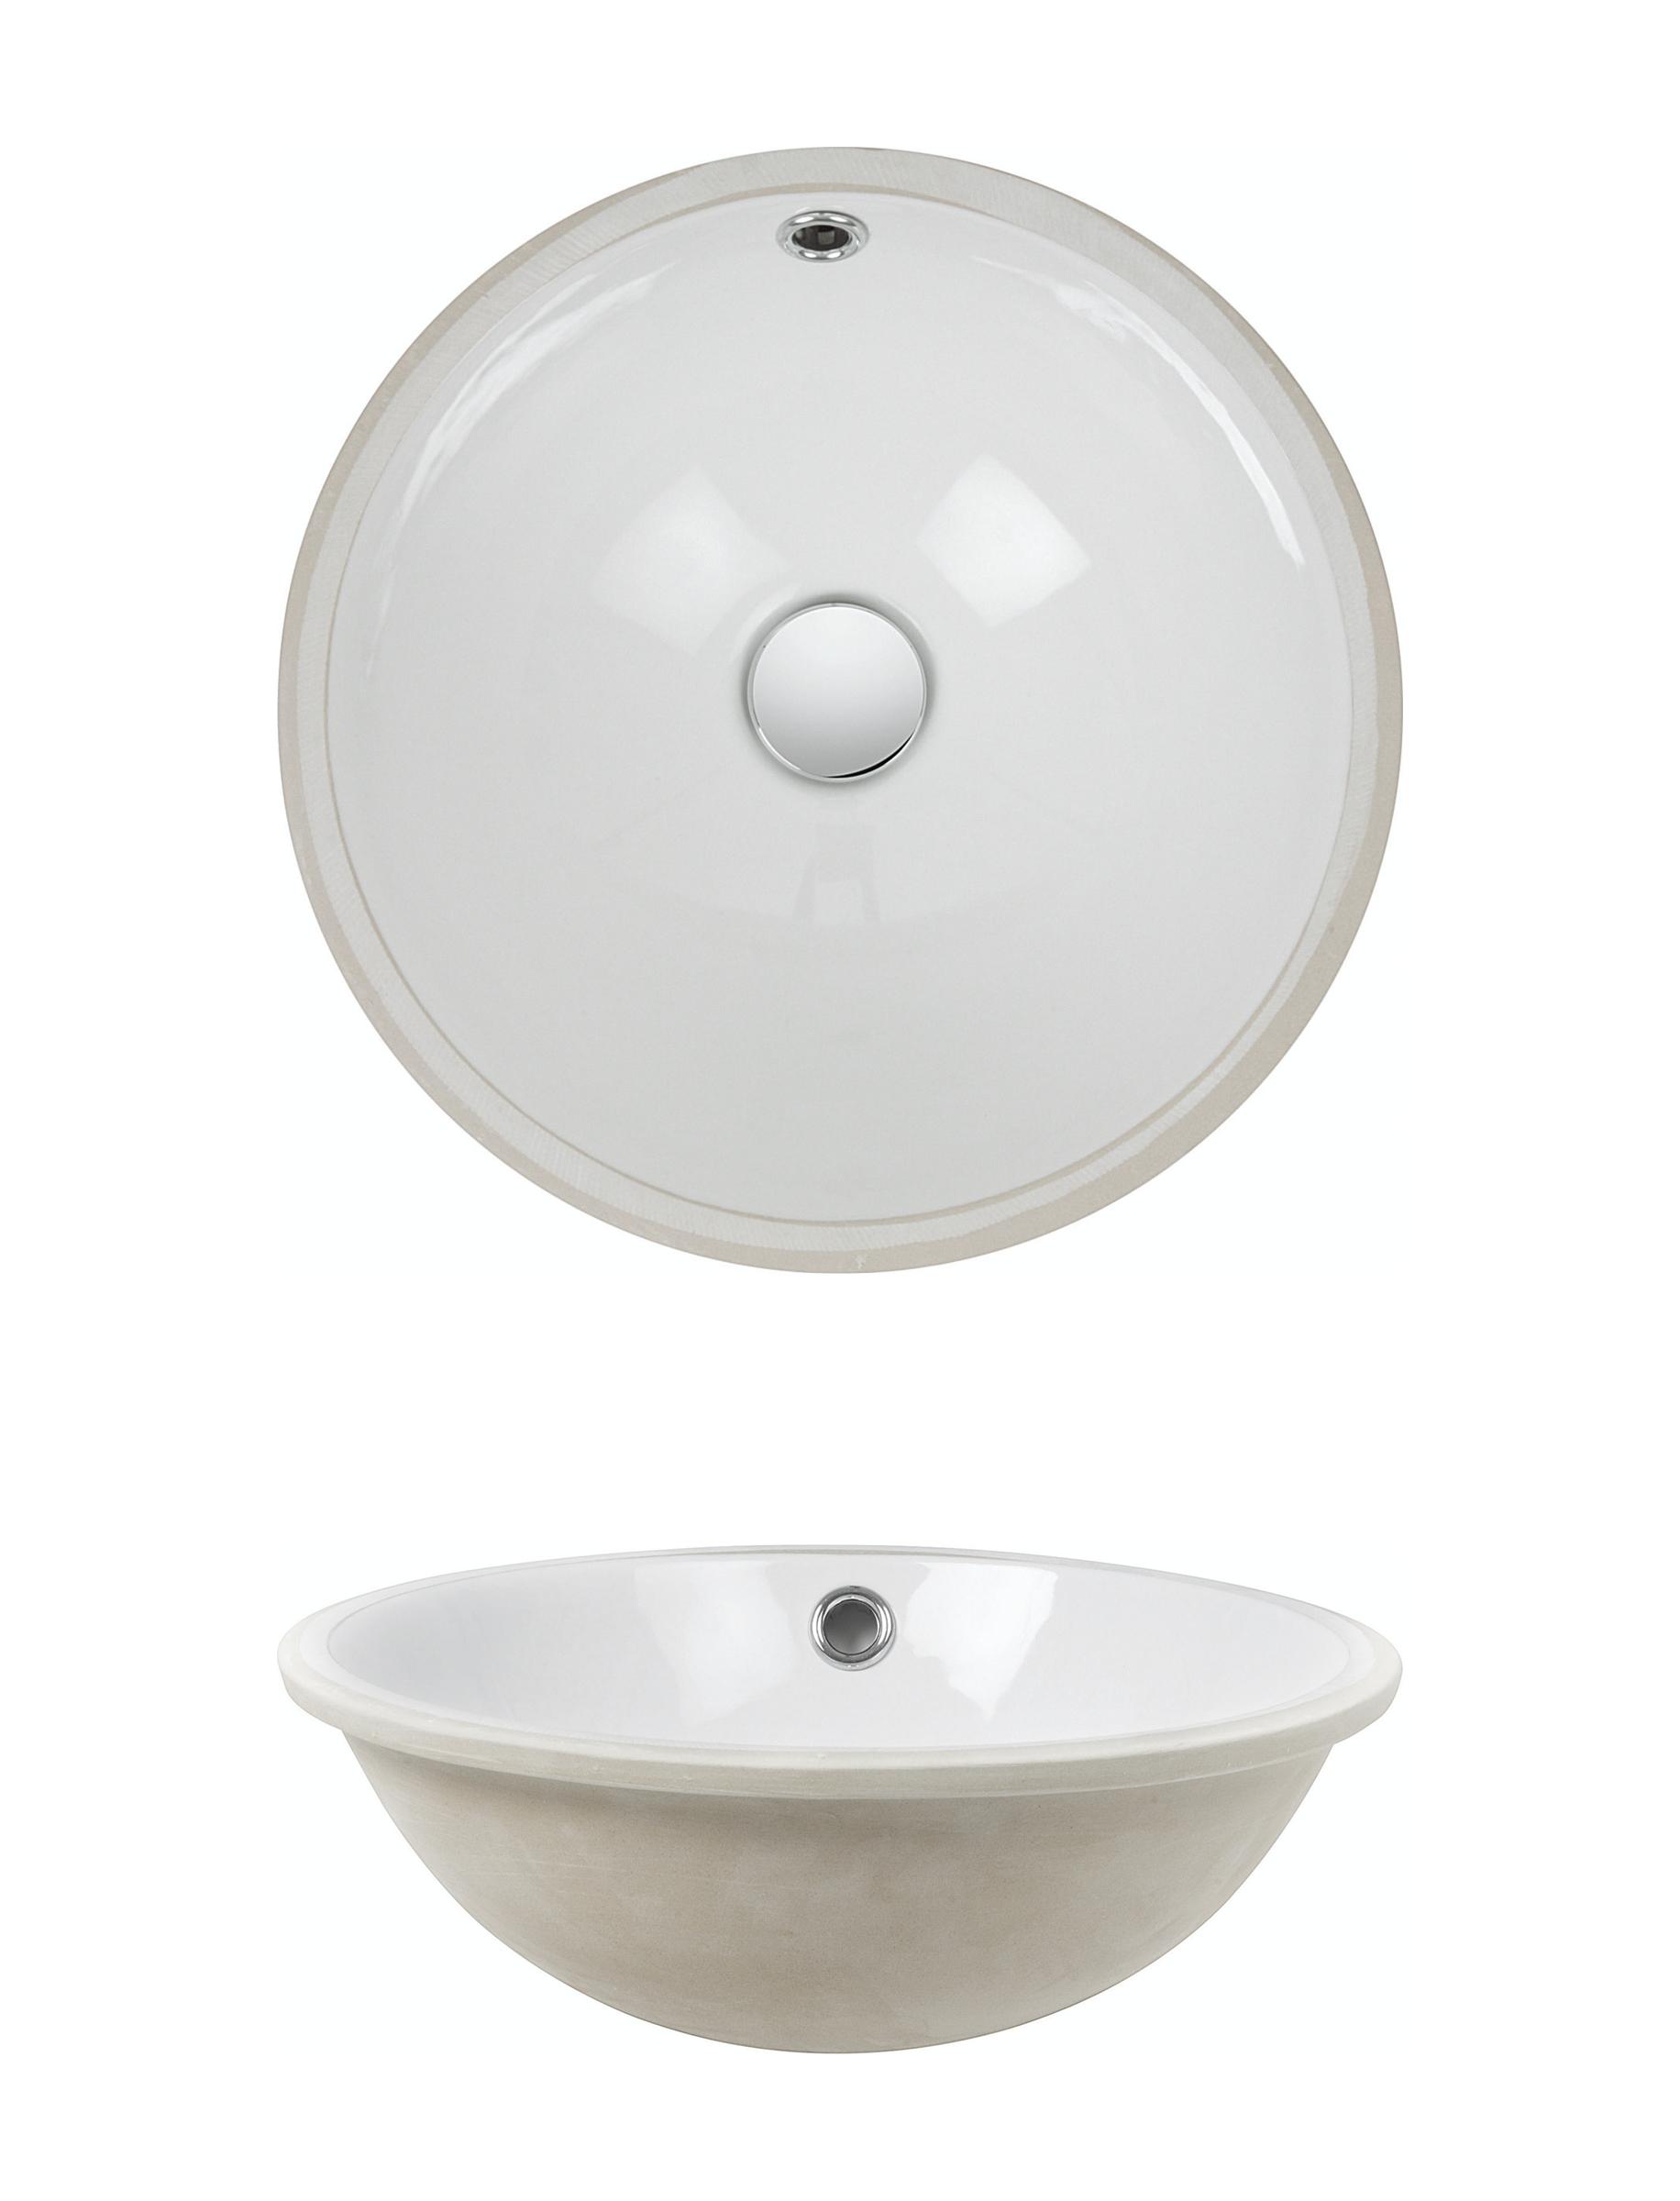 Cerdeña Basin in Undermount | Luxury bathrooms UK, Crosswater Holdings